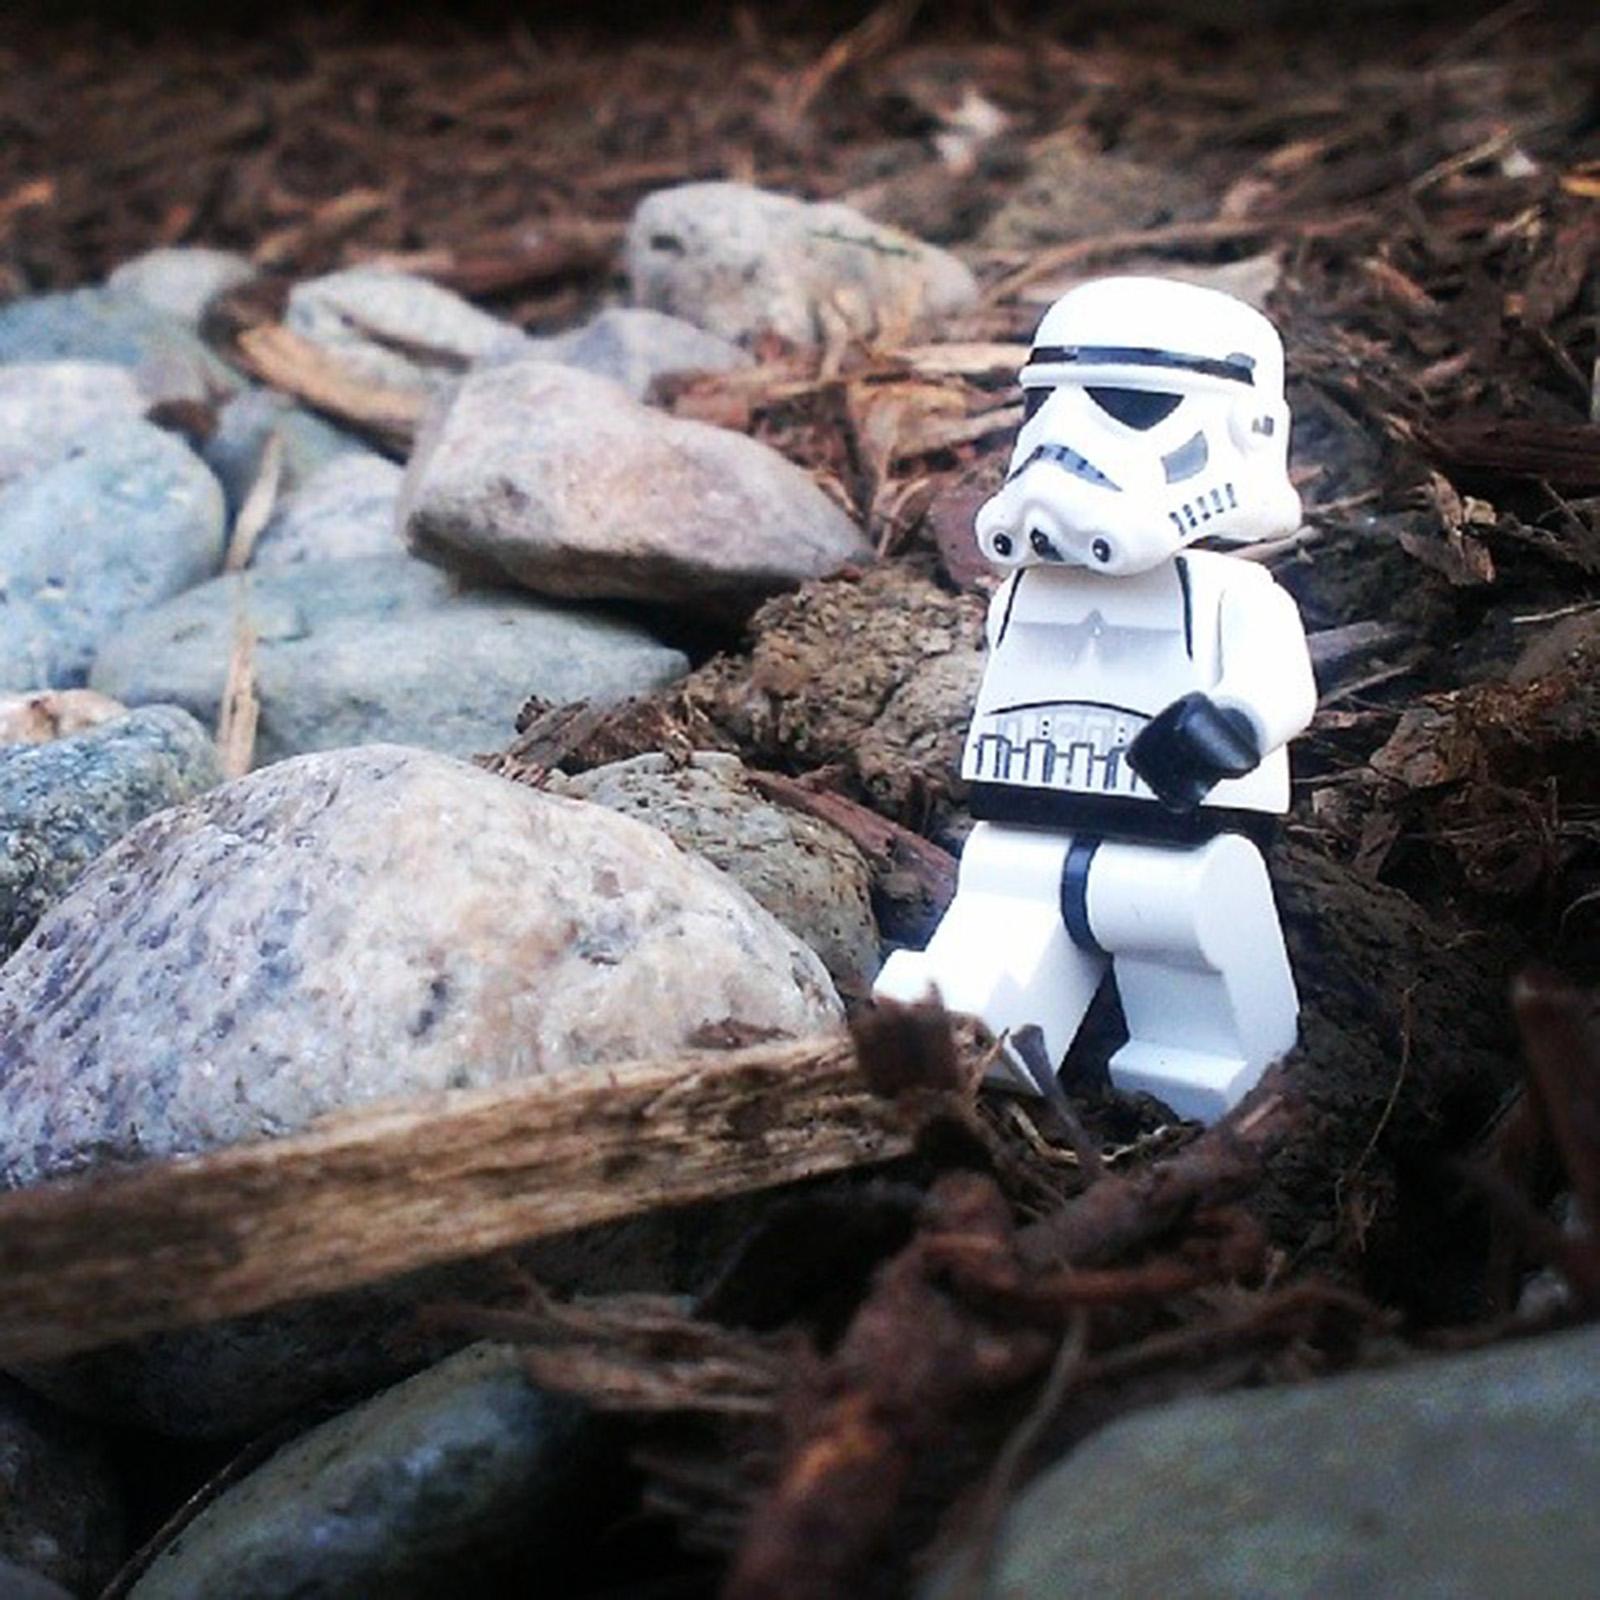 #thelonelytrooper-027.jpg